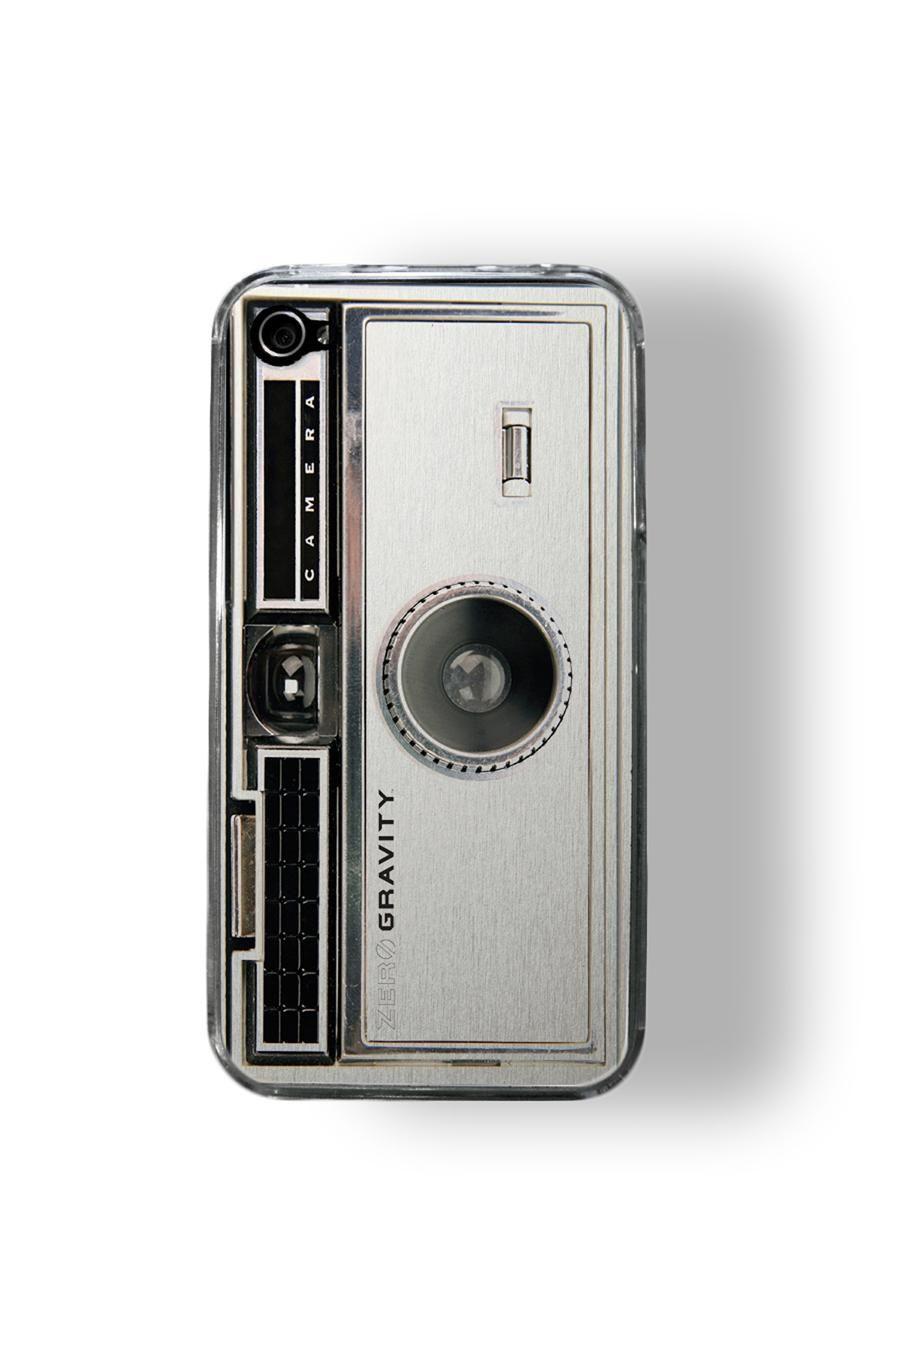 35mm iPhone 4/4S Case